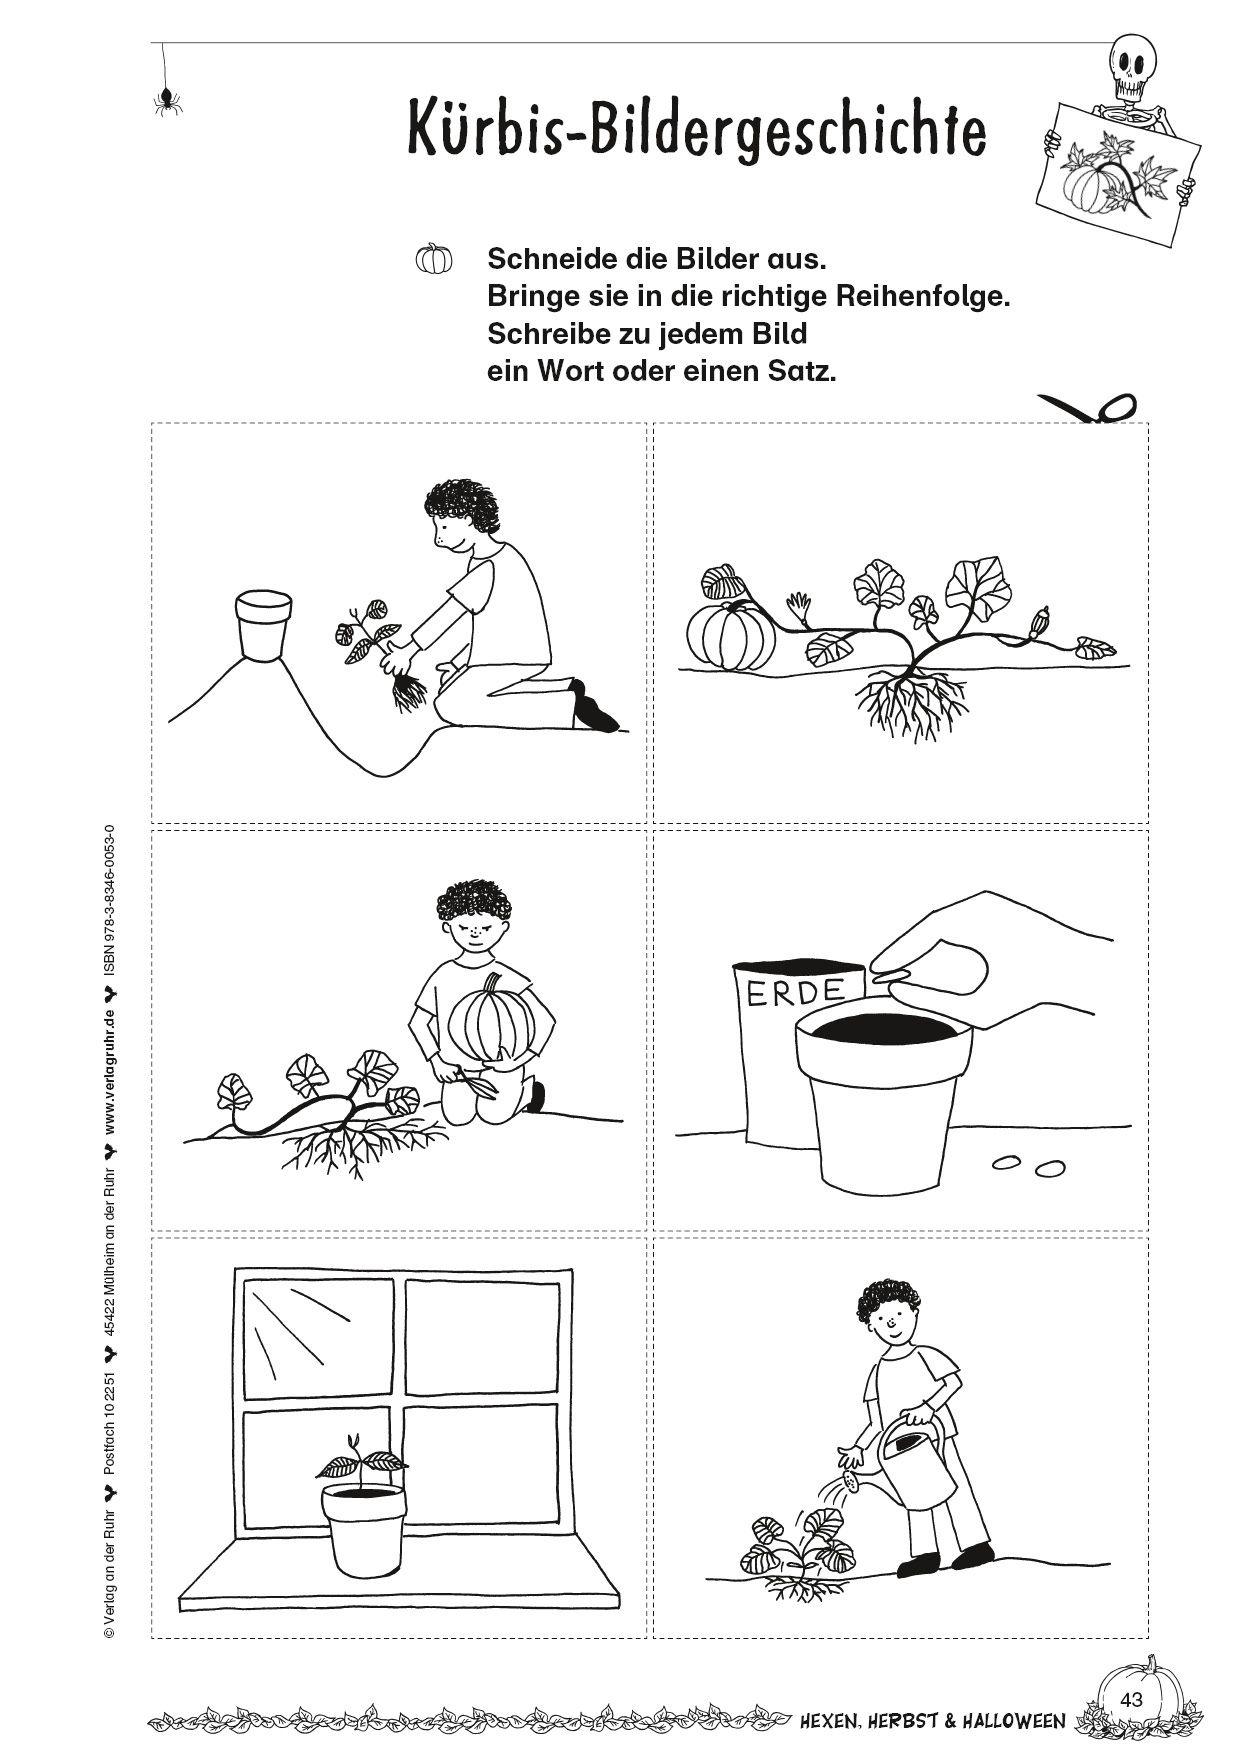 Kopiervorlage Kurbis Bildergeschichte Herbst Hexen Halloween Gespenst Kurbis Freebie G Bildergeschichten Grundschule Bildergeschichte Bildgeschichte